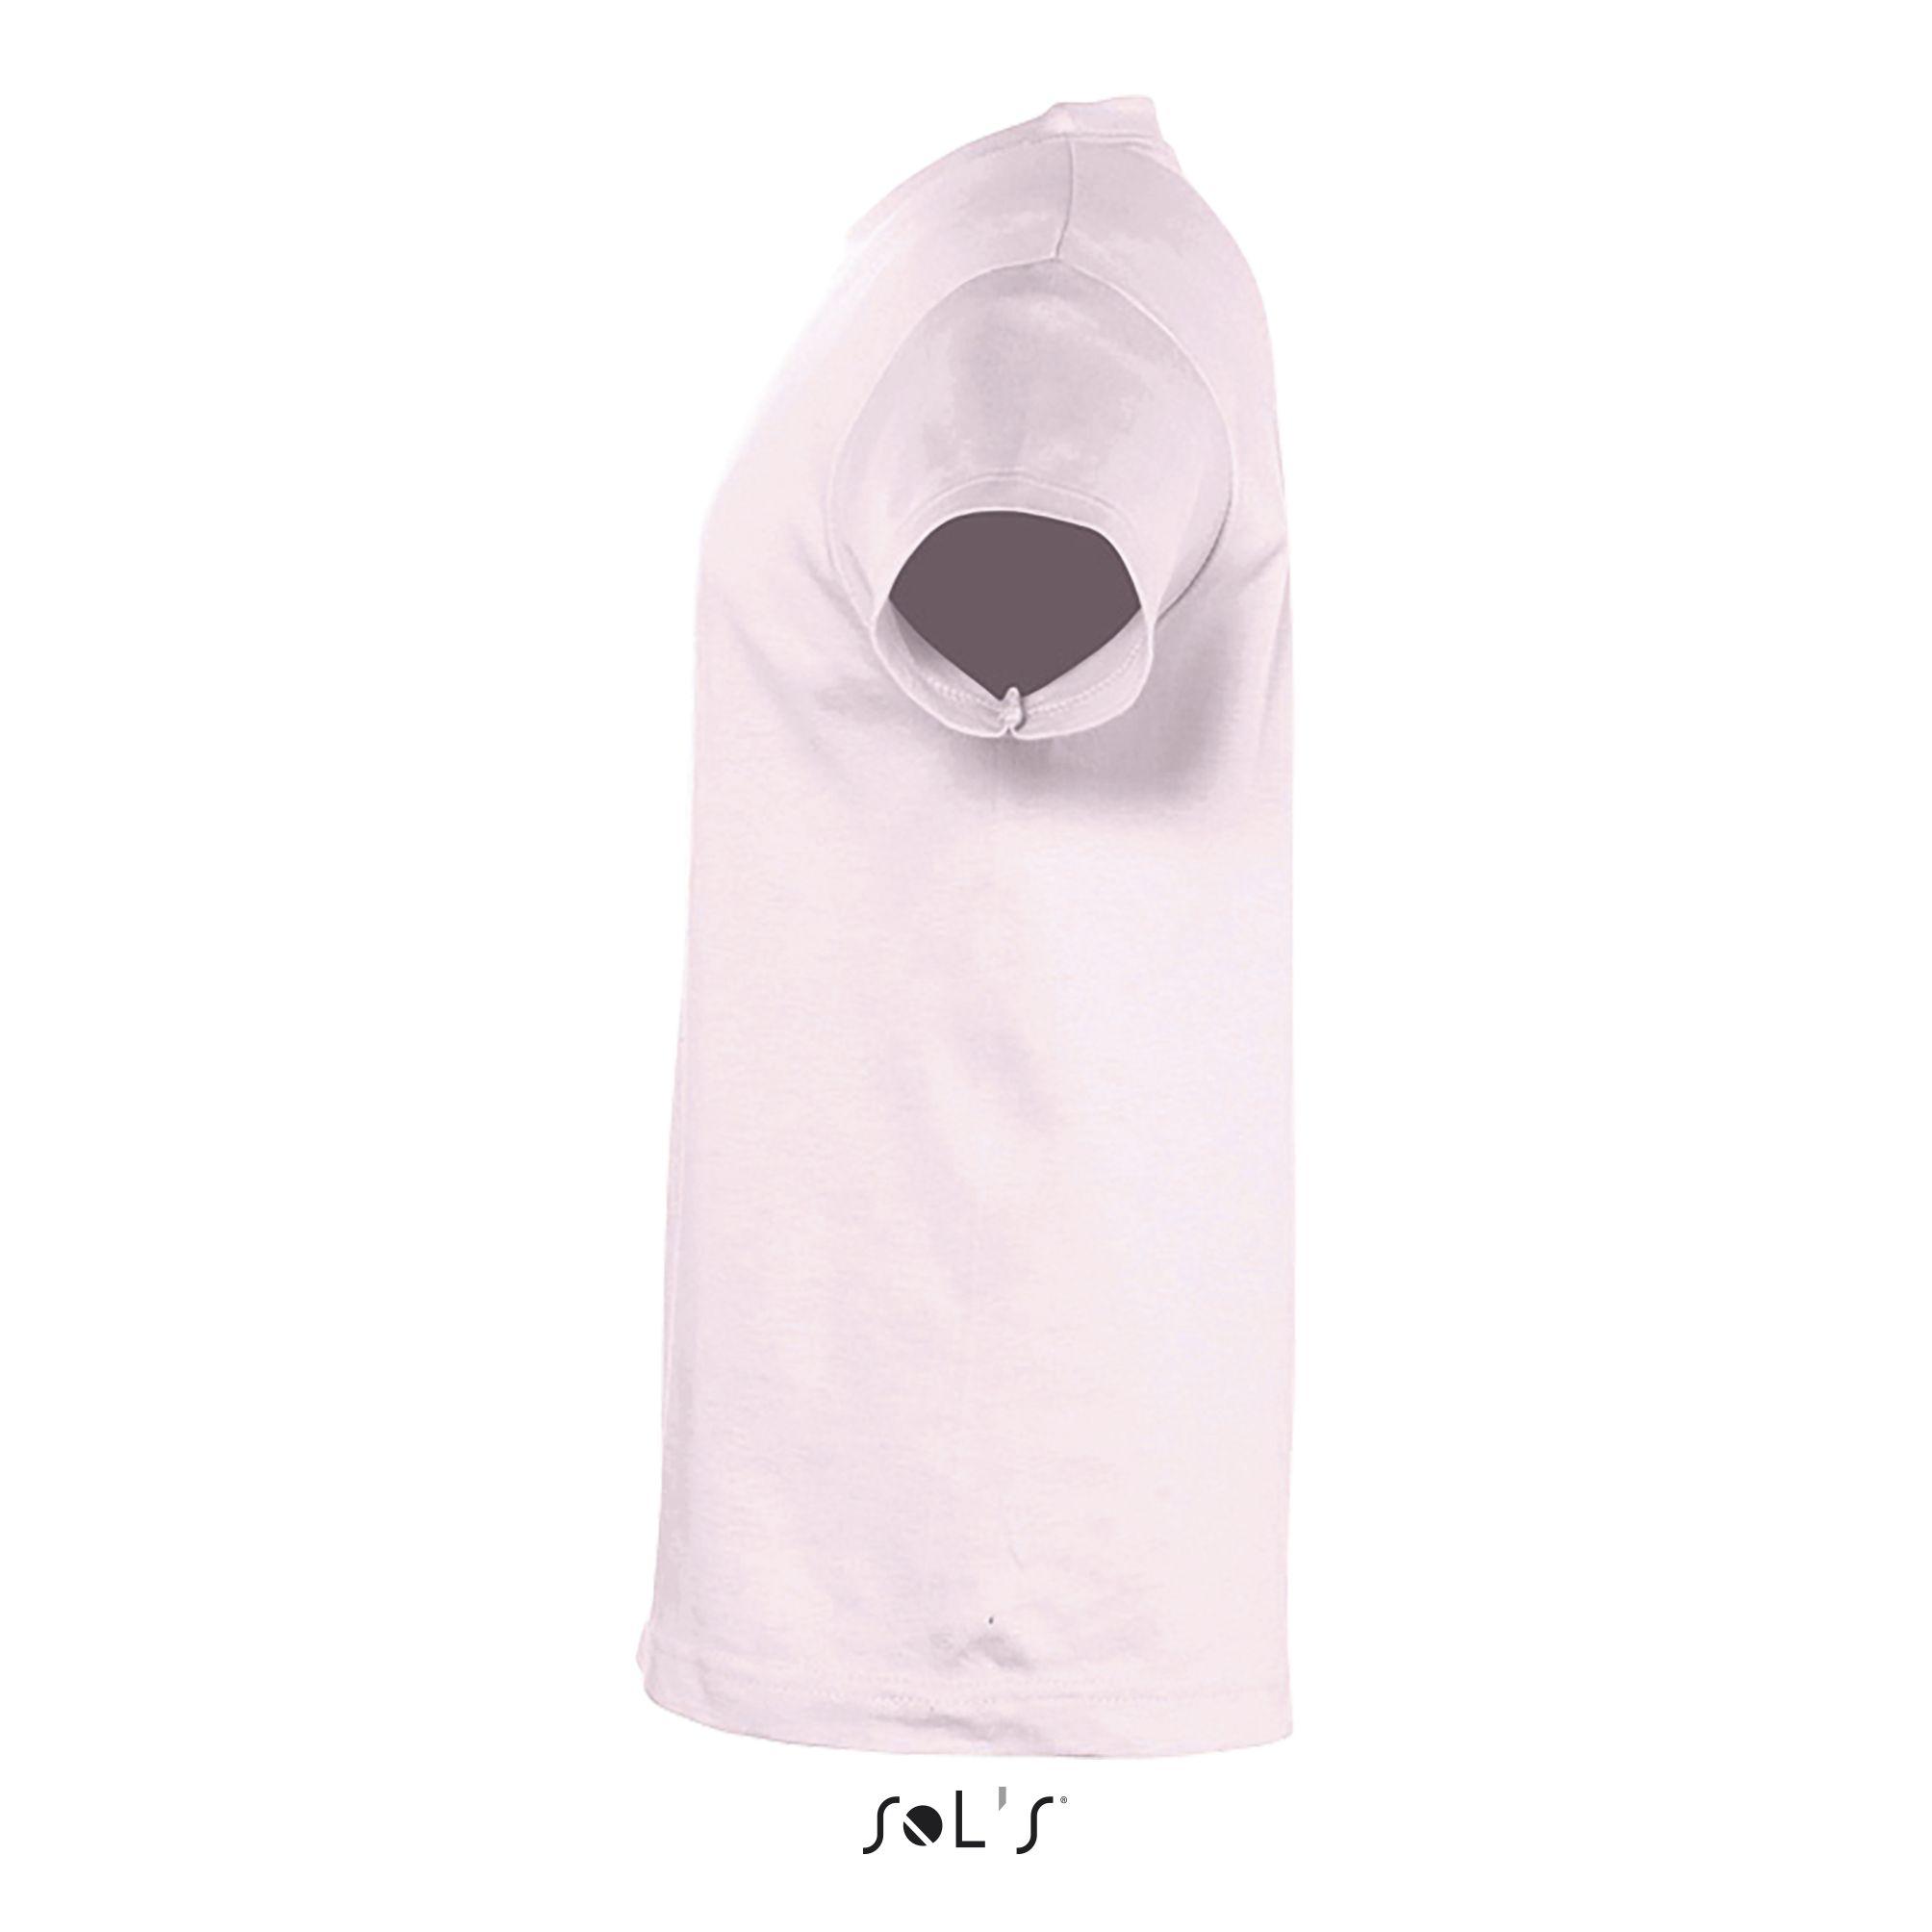 141 - Pale pink